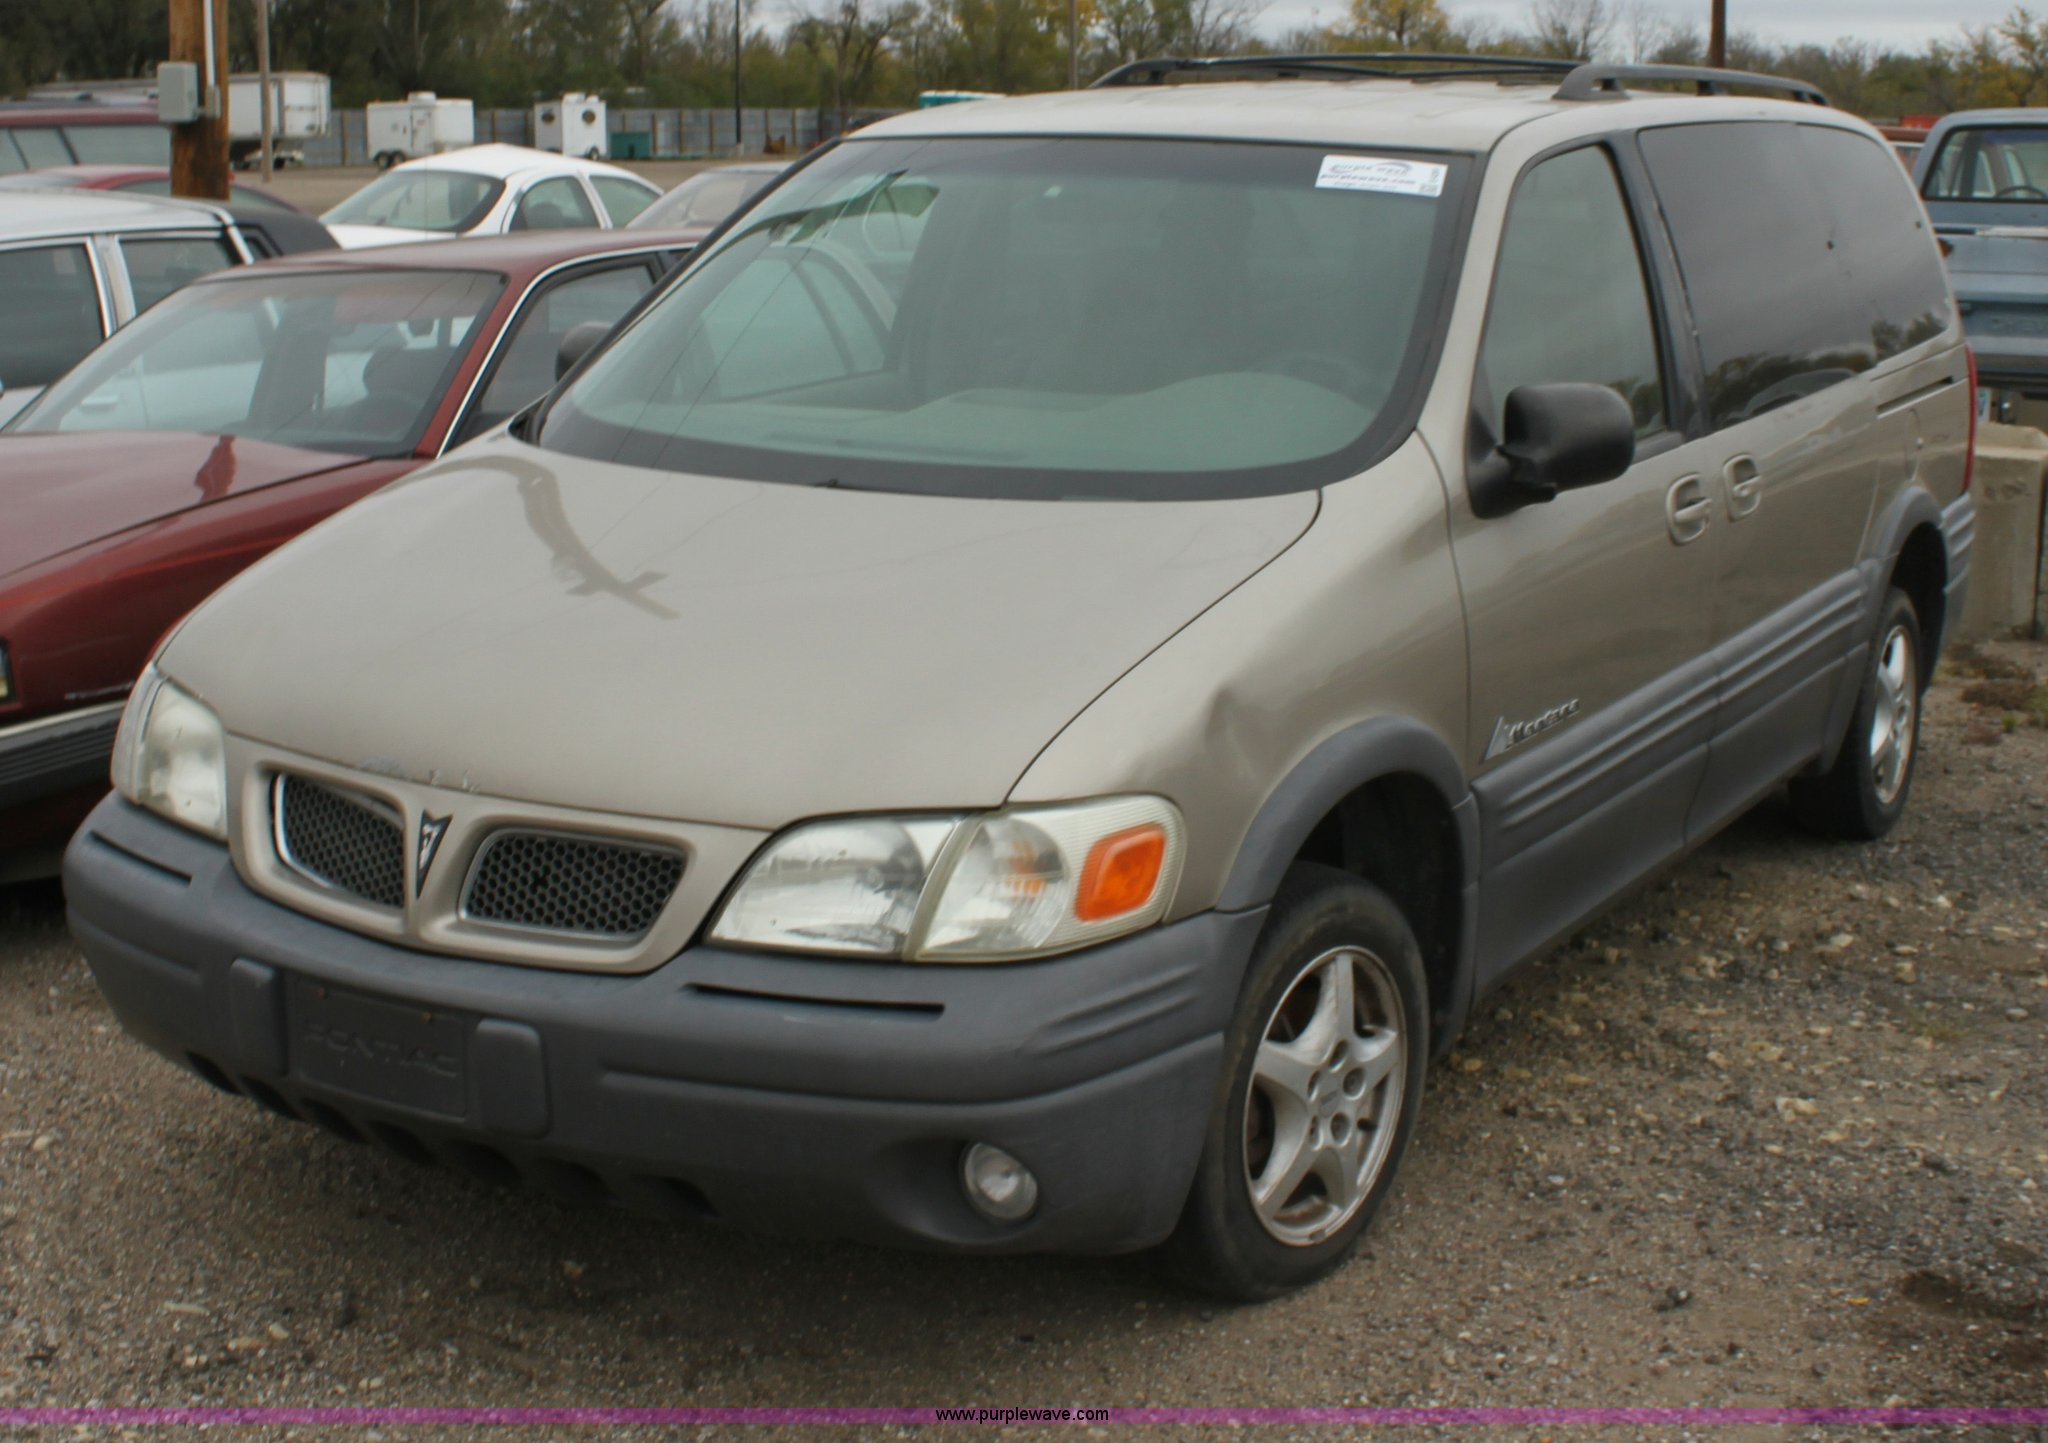 1999 pontiac montana minivan in wichita ks item e4281 sold purple wave 1999 pontiac montana minivan in wichita